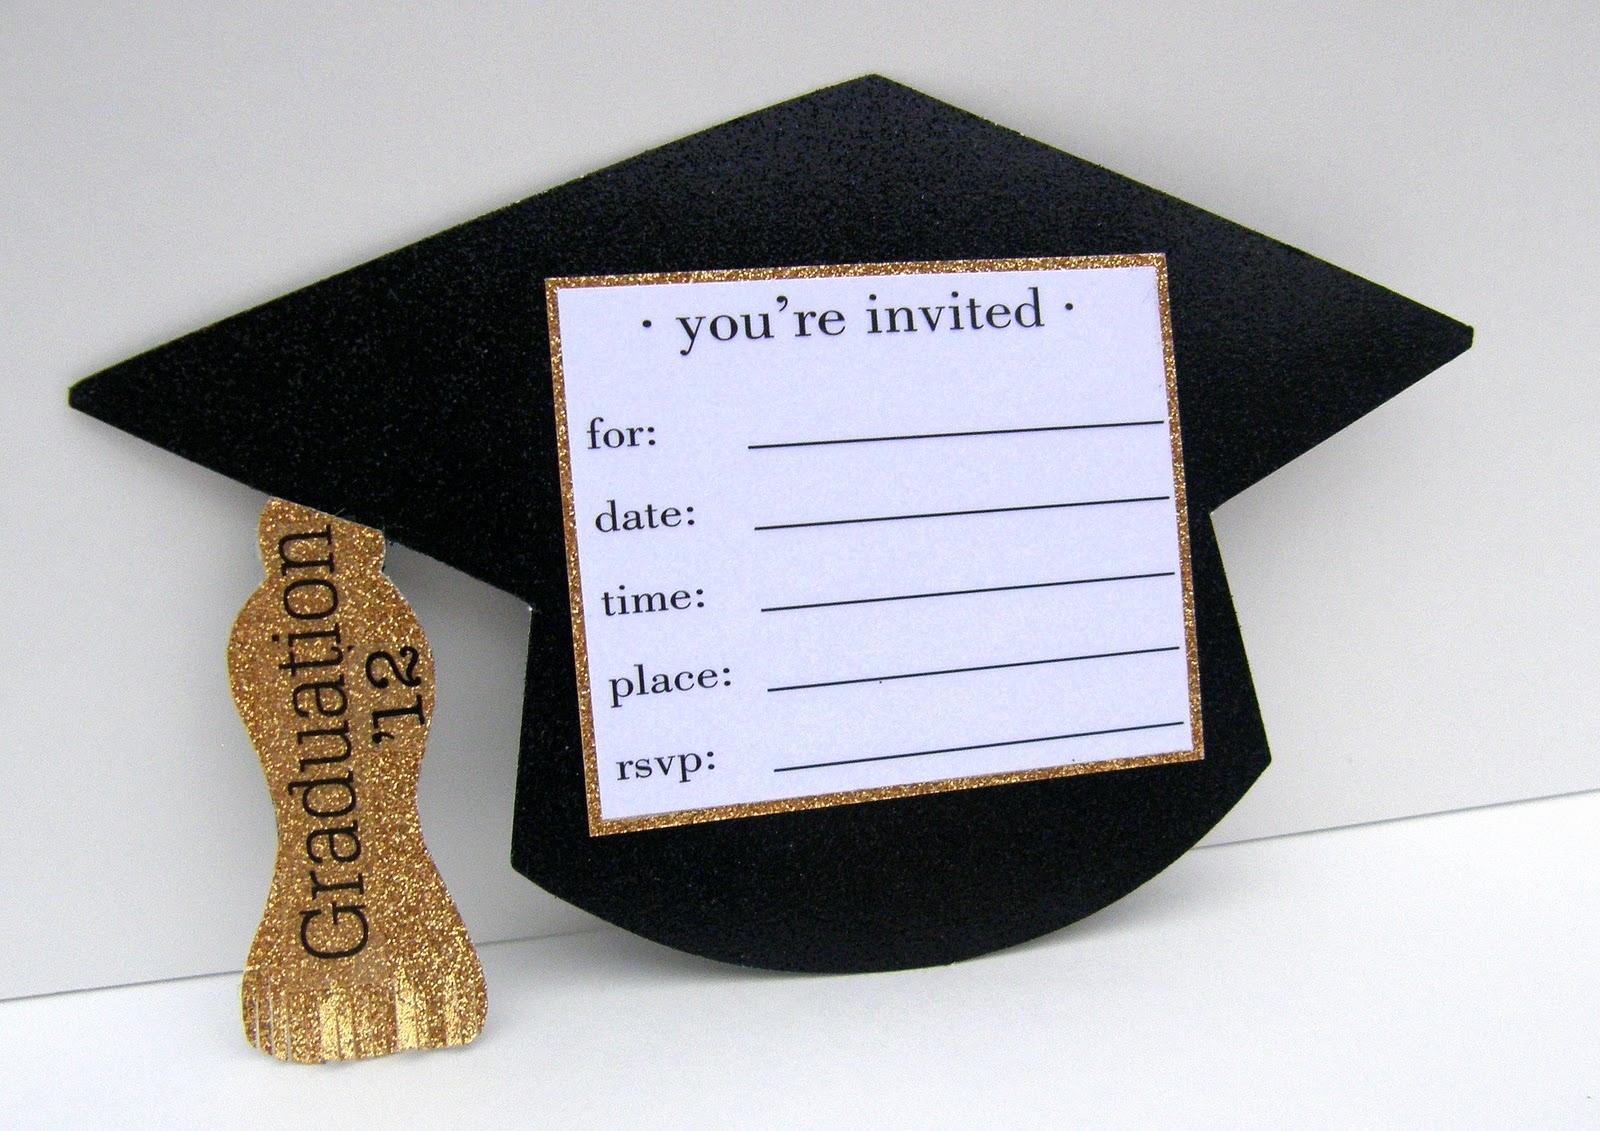 Homemade Graduation Invitation Ideas Lovely Homemade Graduation Invitation Ideas Cobypic